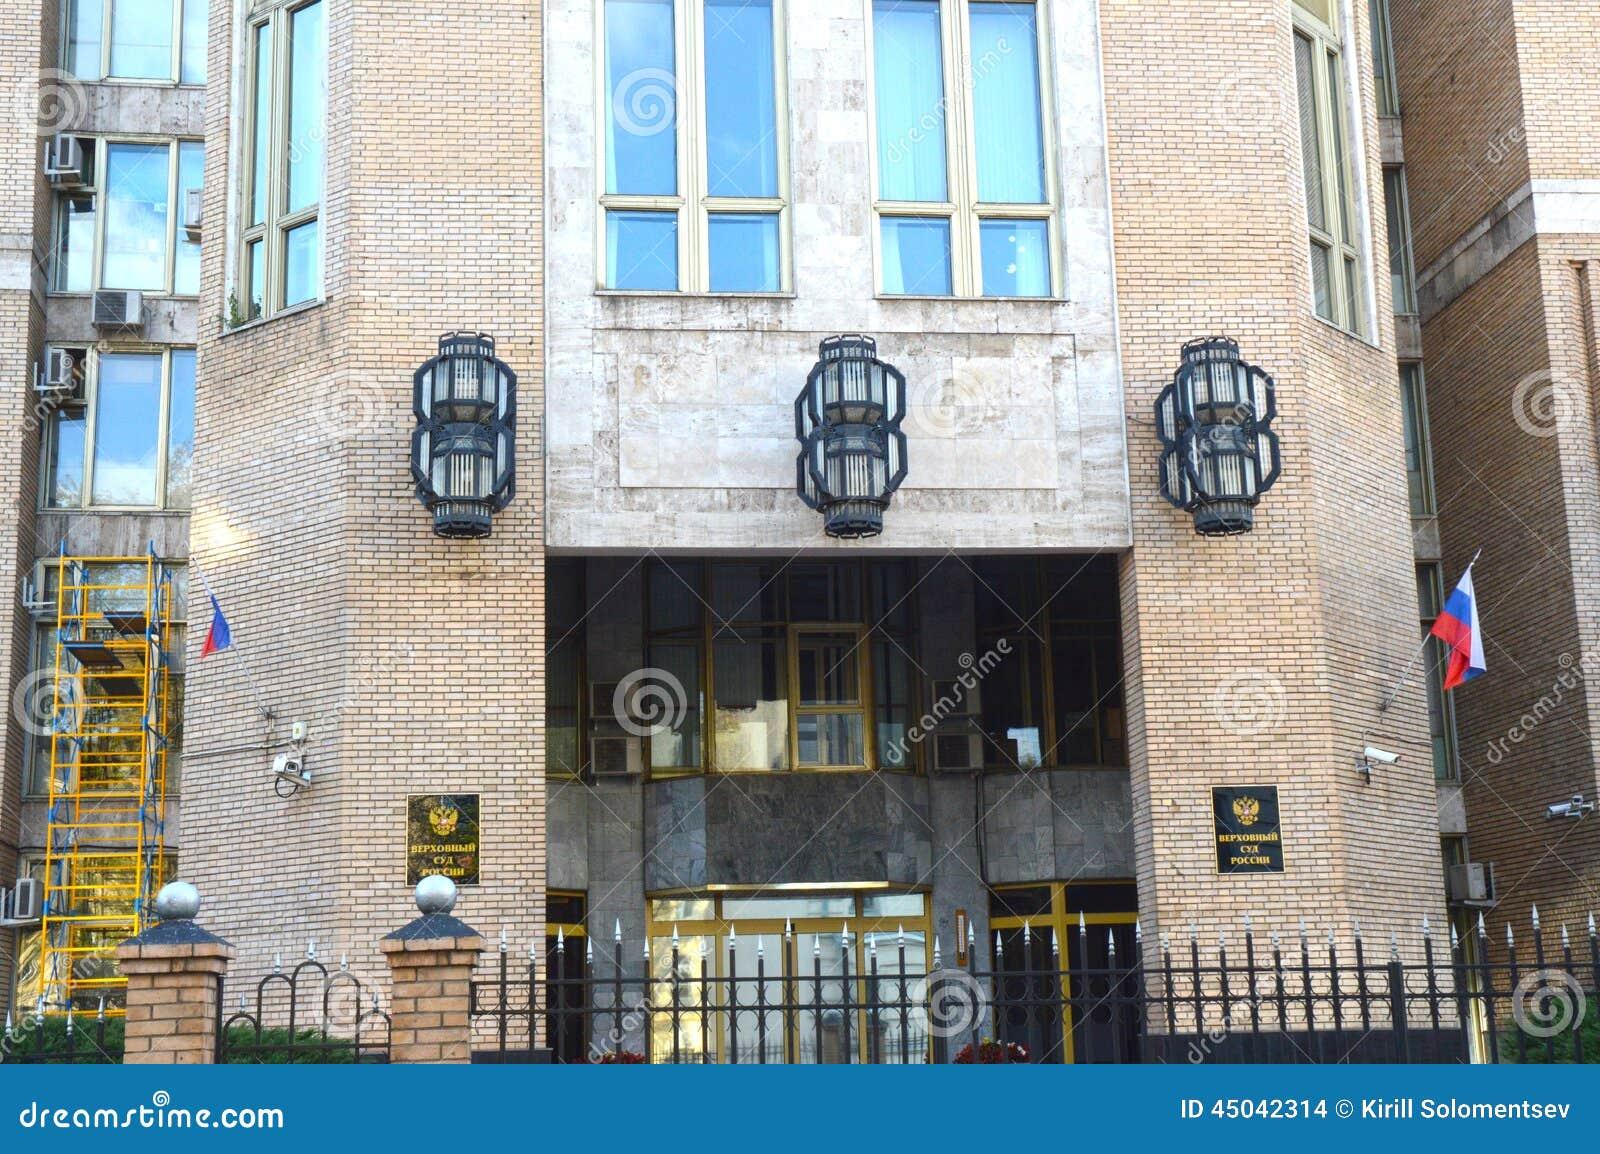 Russian Federation The Supreme 100